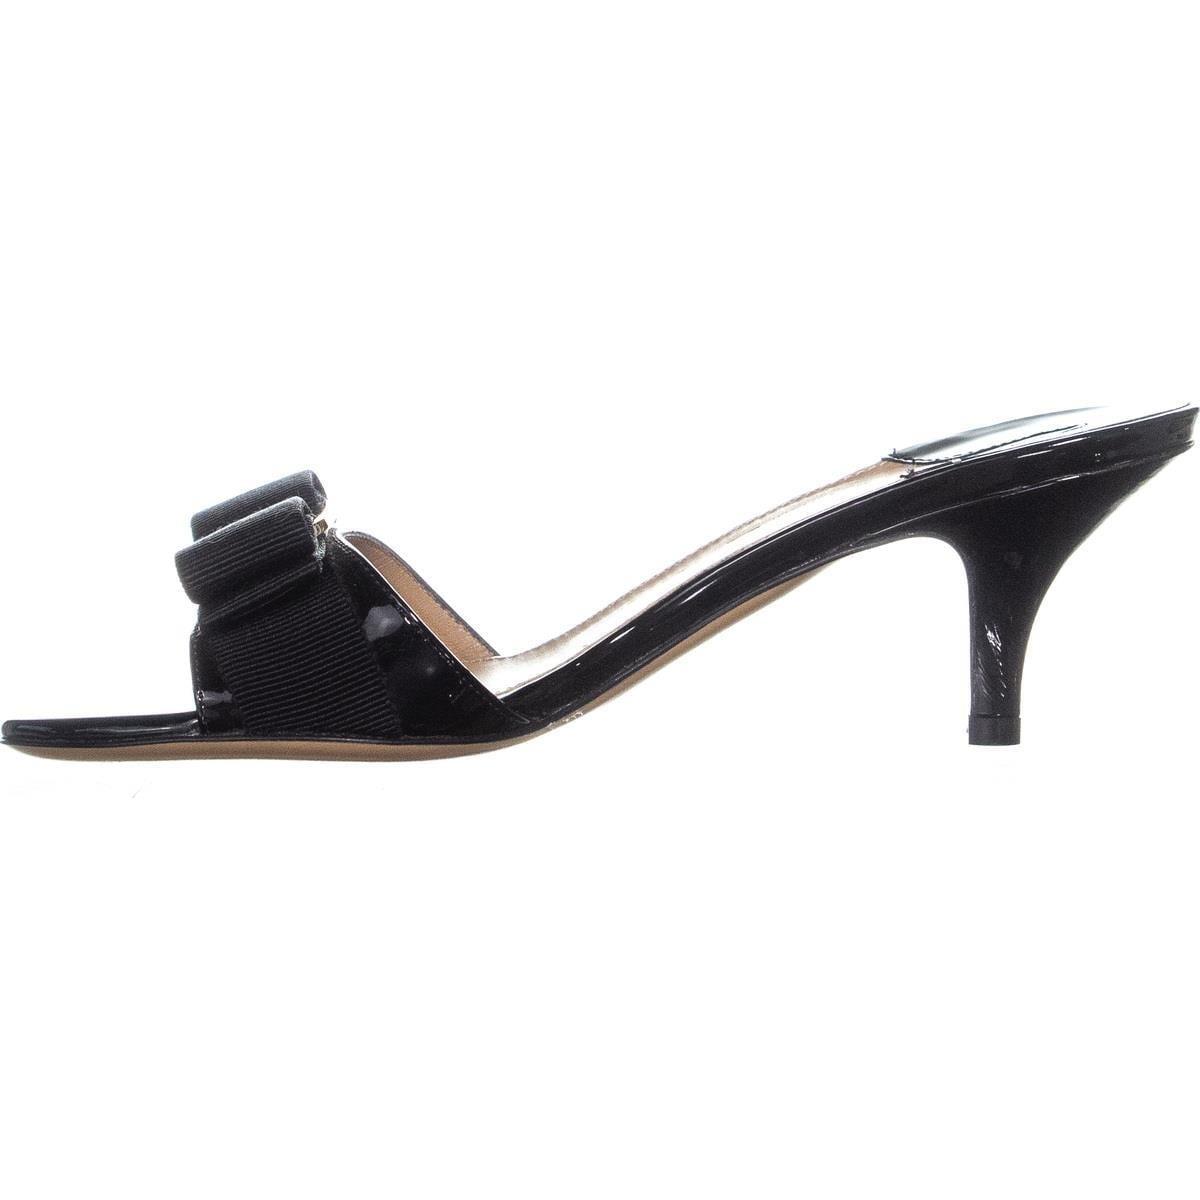 6f25e74dc7 Shop Salvatore Ferragamo Glory1 Mule Kitten Heels, Nero - Free Shipping  Today - Overstock - 25363704